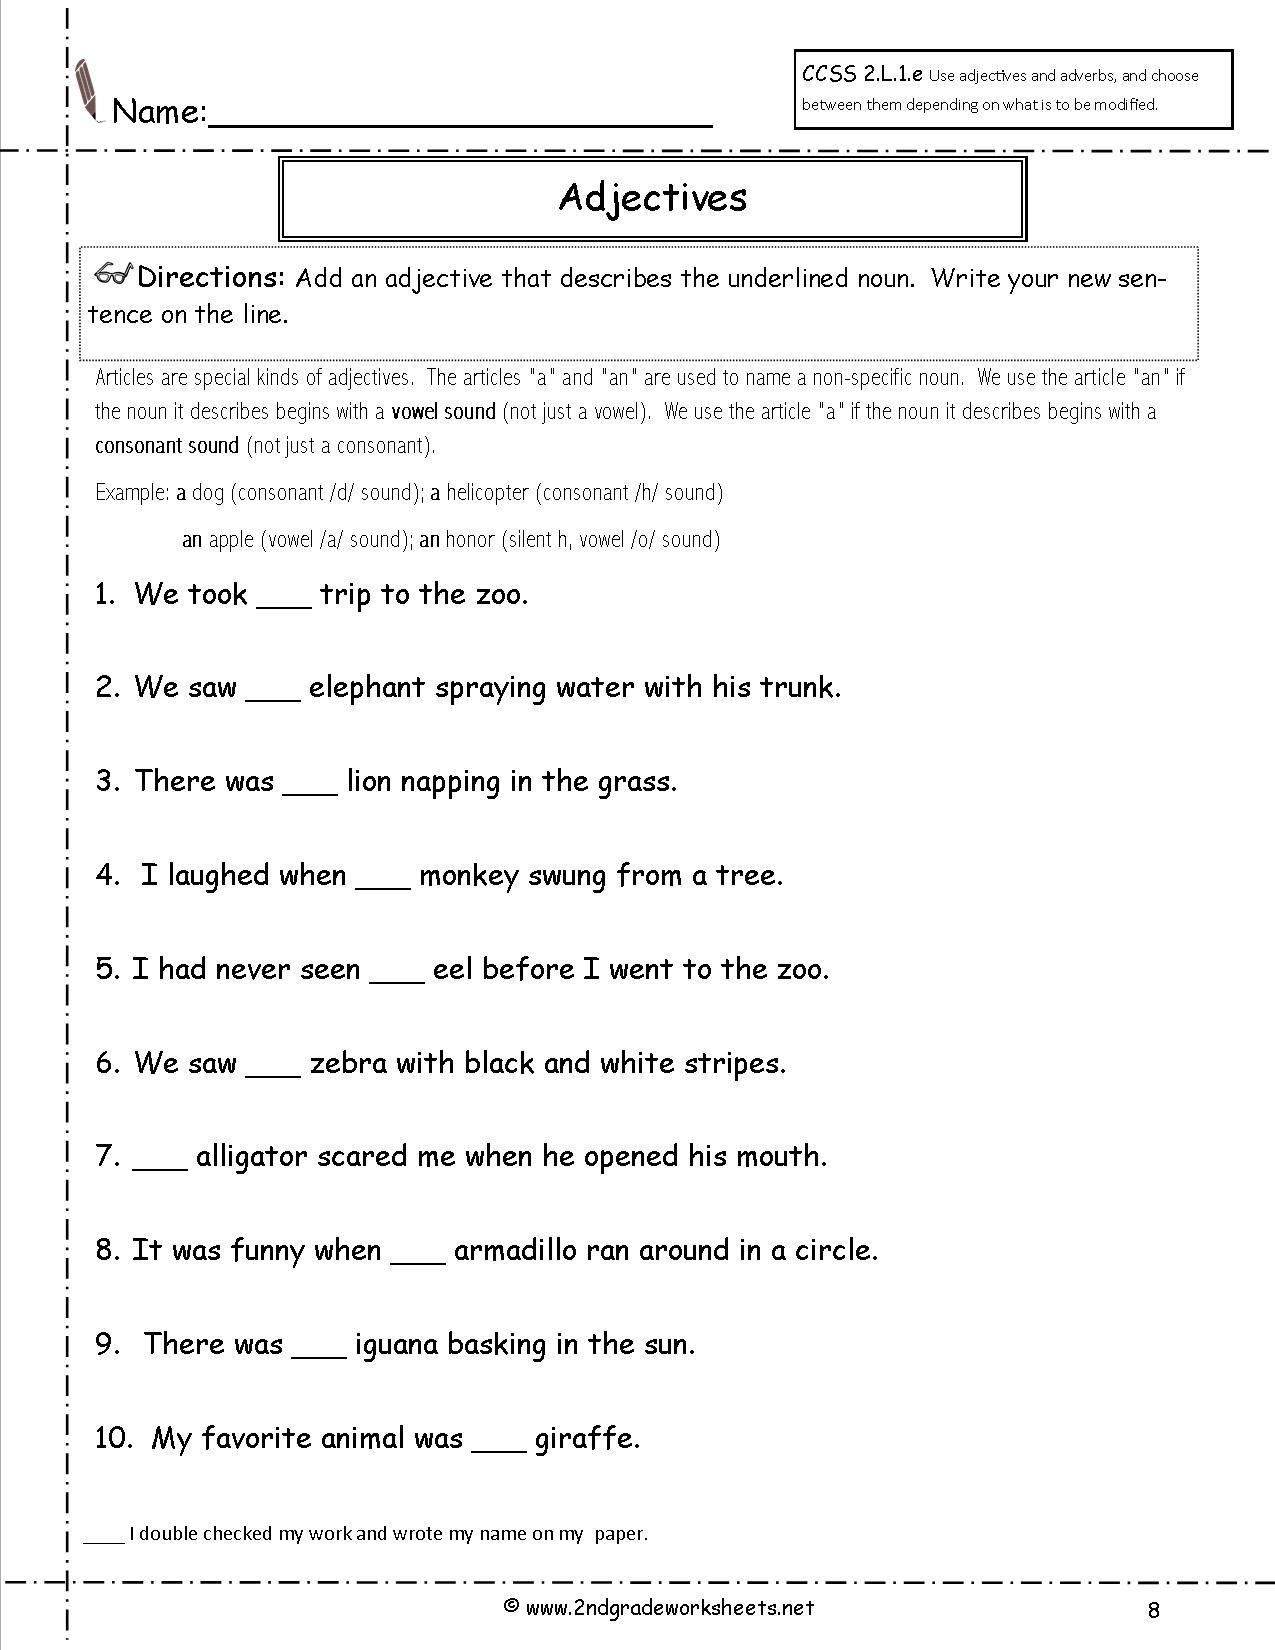 Free Language/grammar Worksheets And Printouts - Free Printable English Lessons